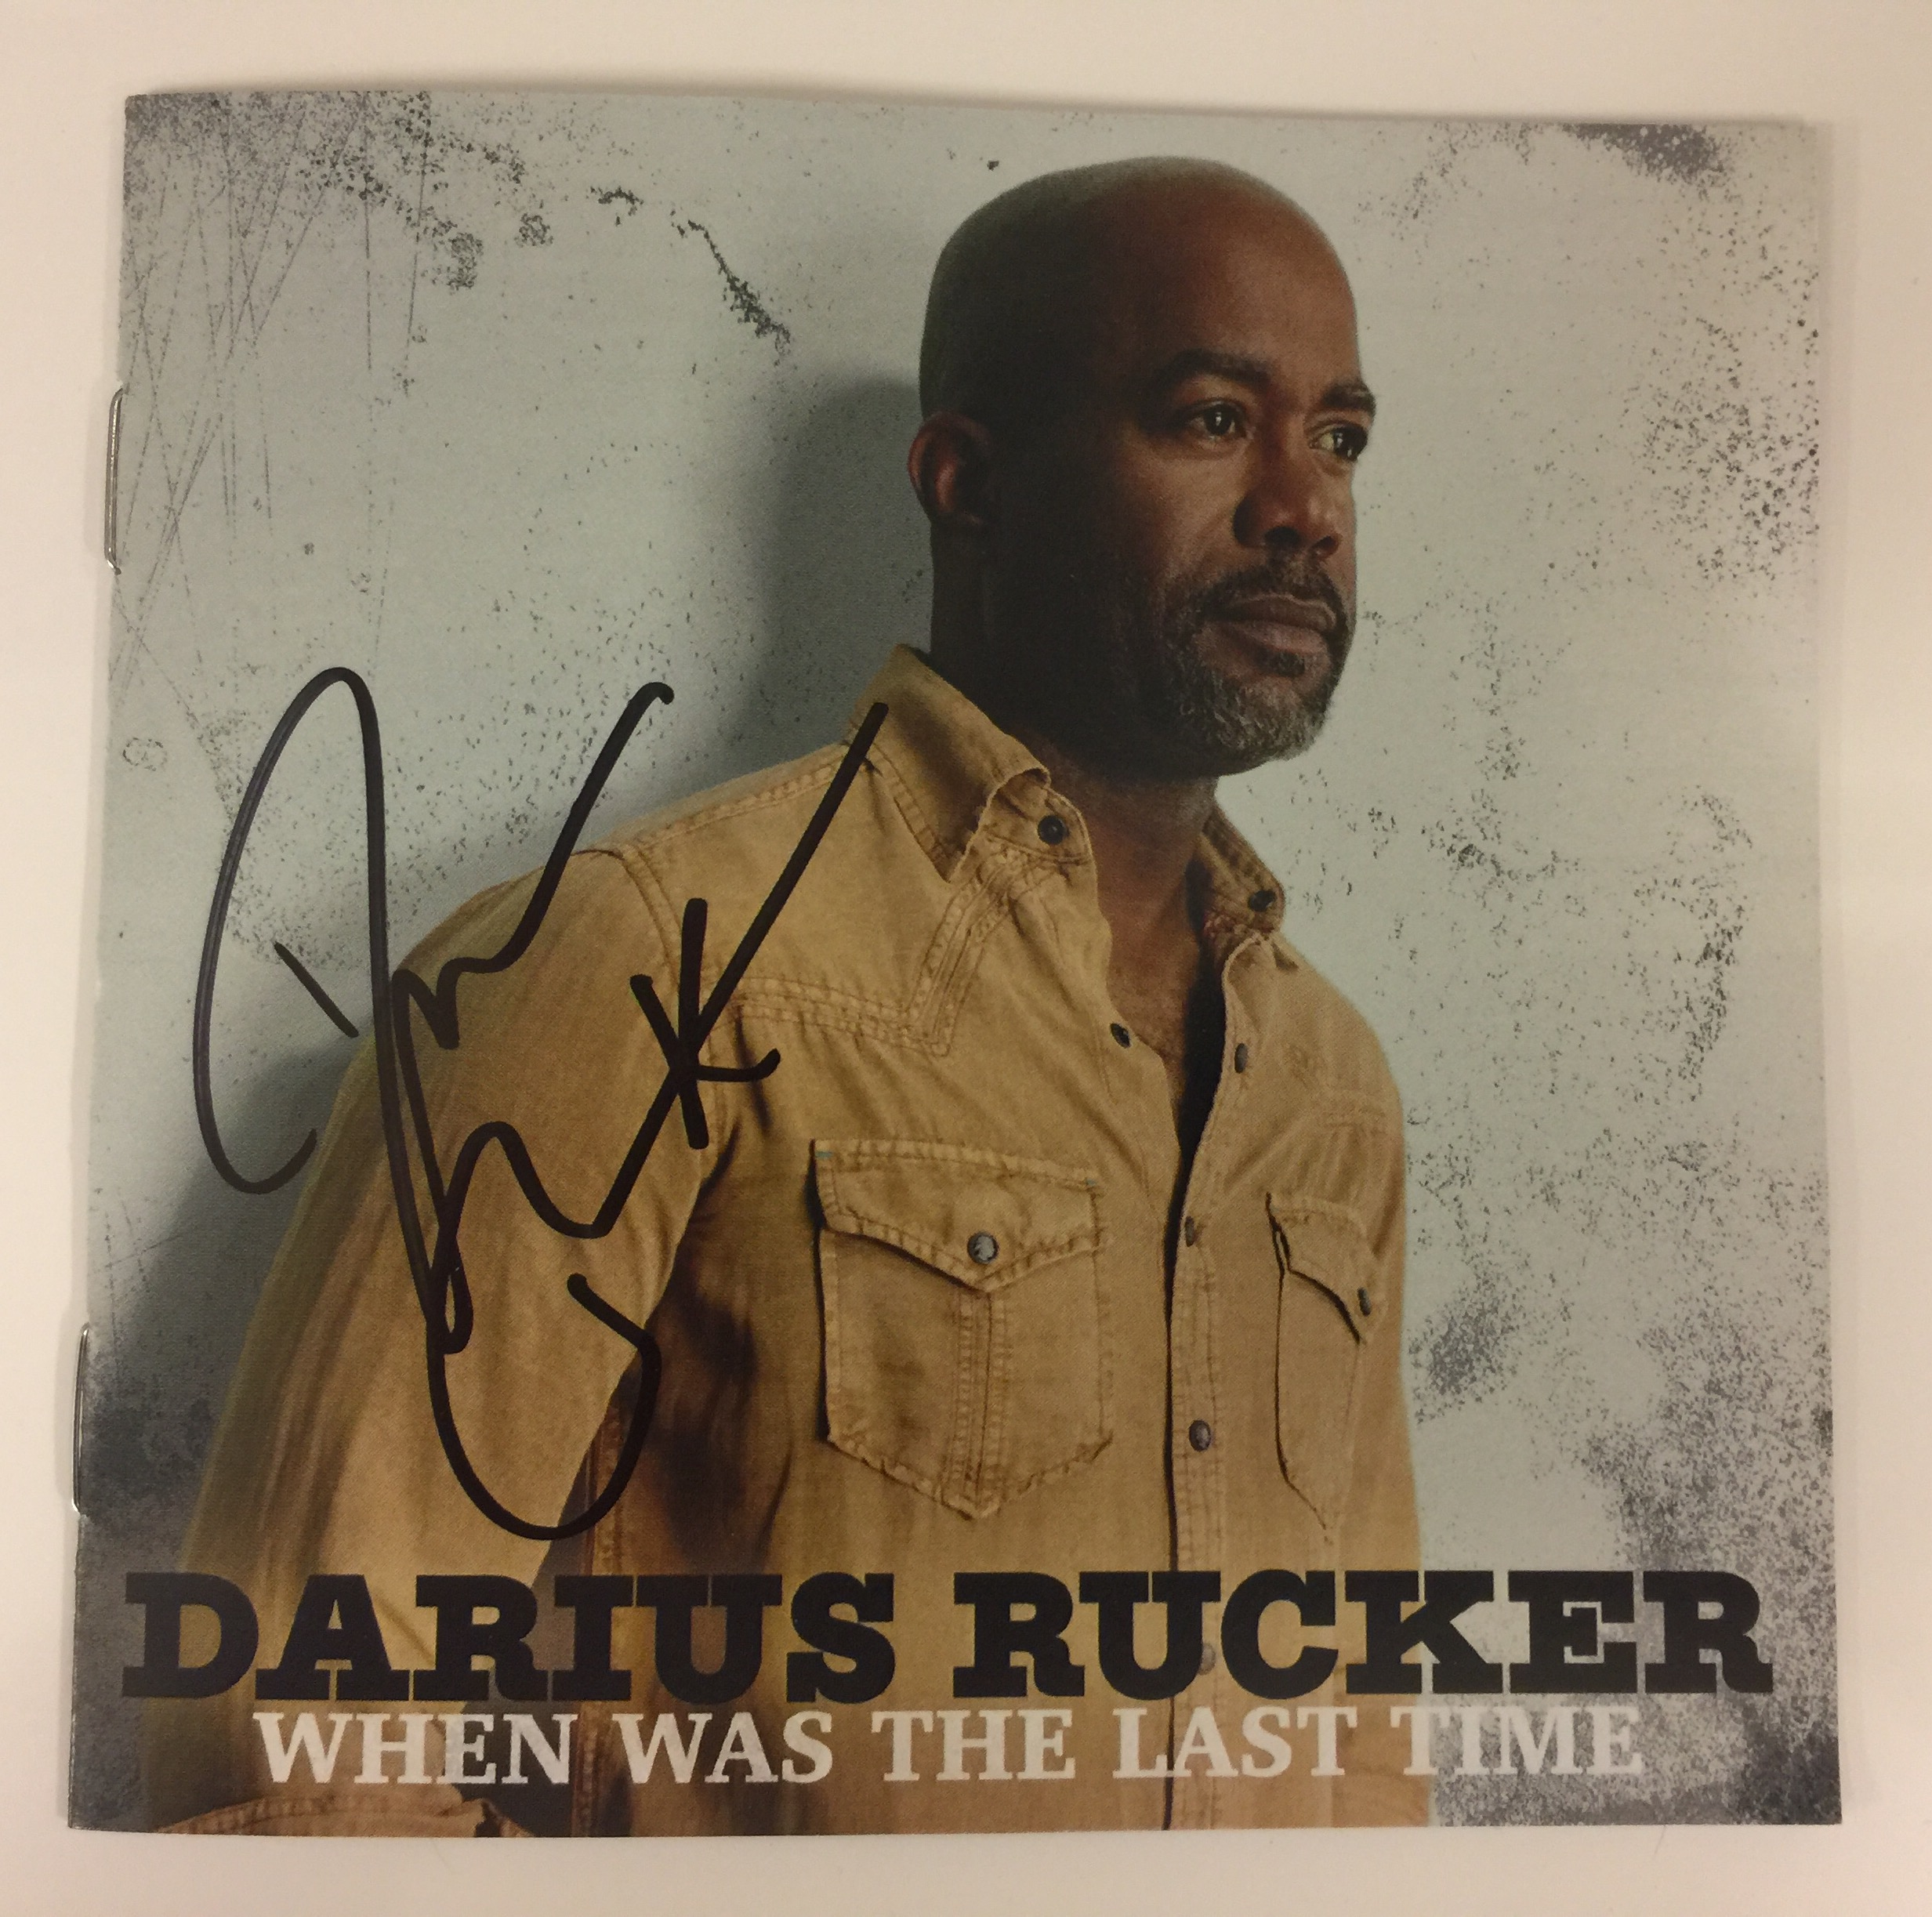 Darius Rucker 'When Was The Last Time' CD; Photo courtesy UMG Nashville